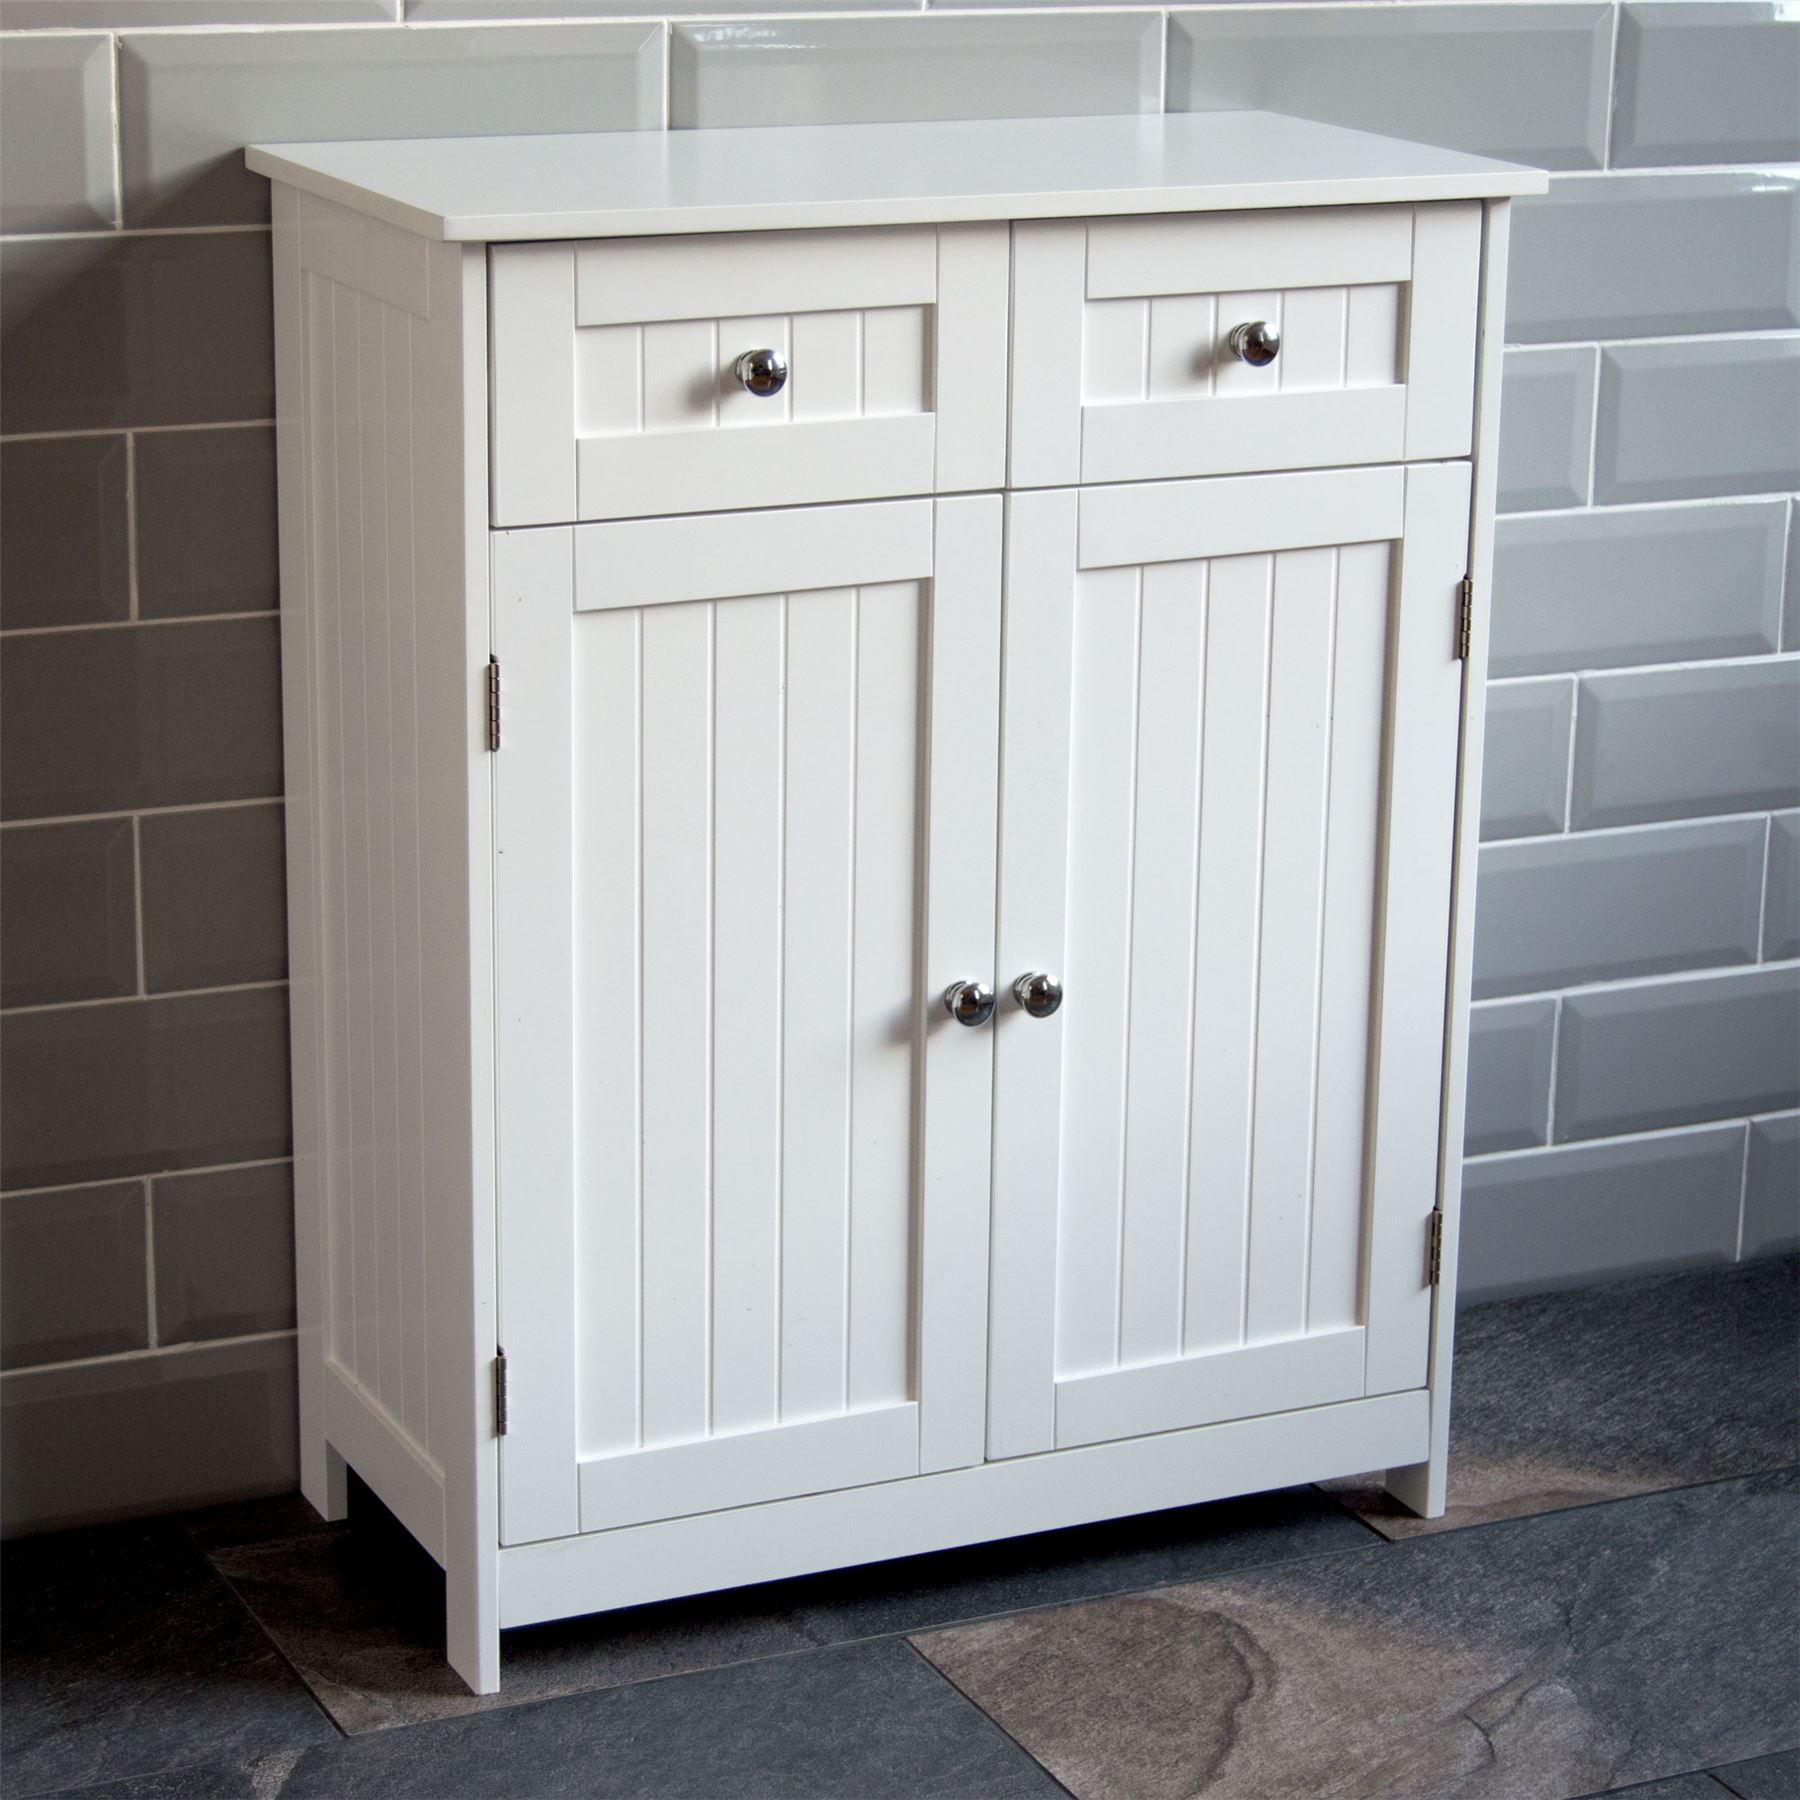 Details About Priano Bathroom Cabinet 2 Drawer 2 Door Storage Cupboard Unit Furniture White inside size 1800 X 1800